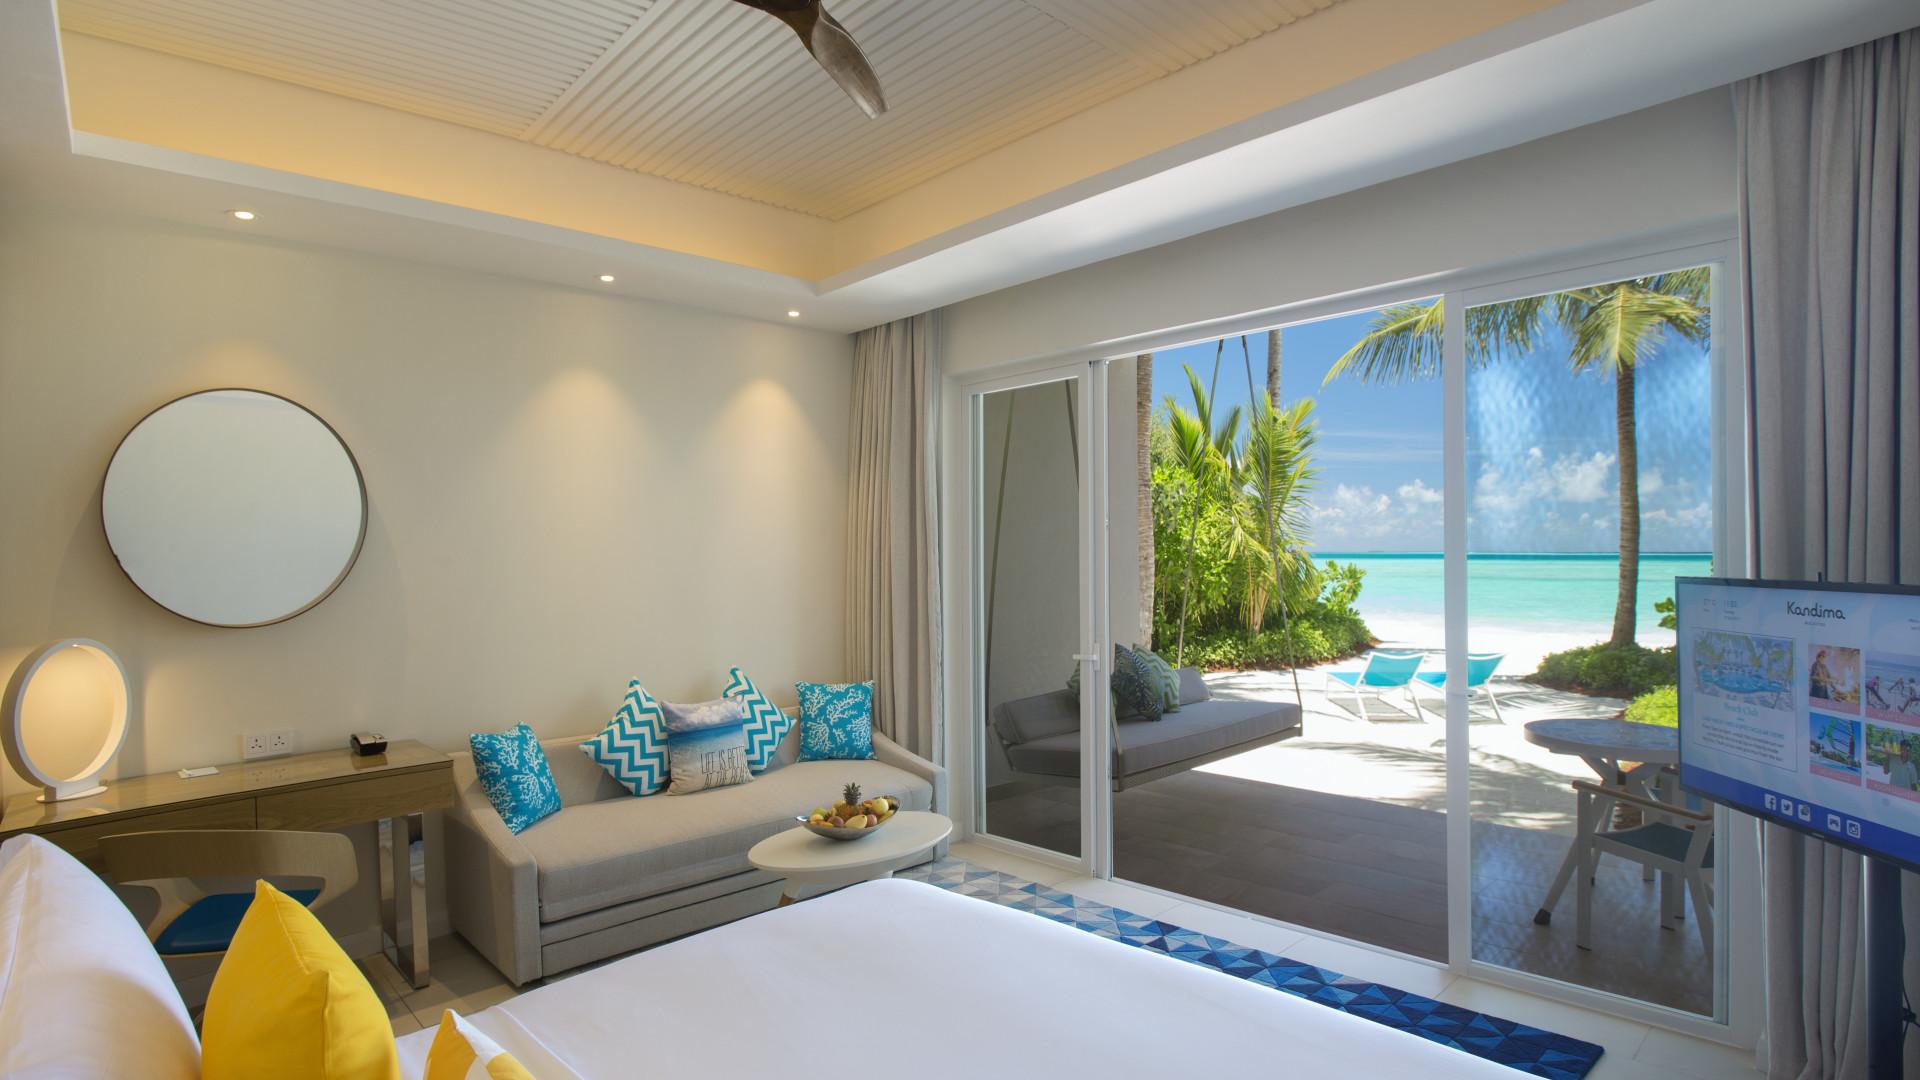 Kandima Maldives' groundbreaking Sky Studios